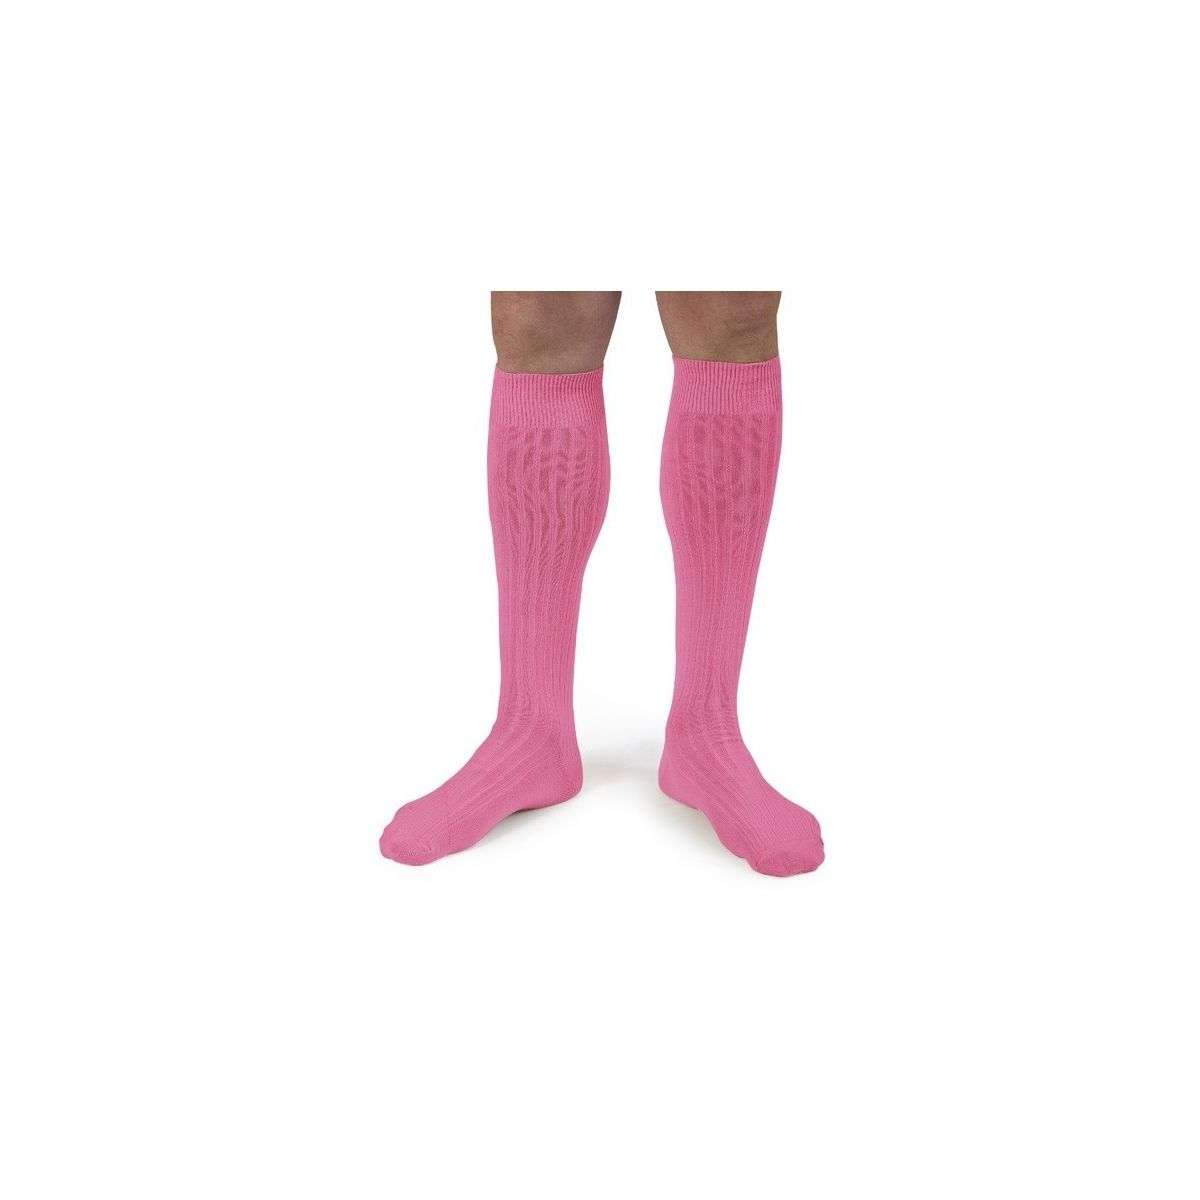 Collégien Podkolanówki Rose fluo neon pink odblaskowy róż